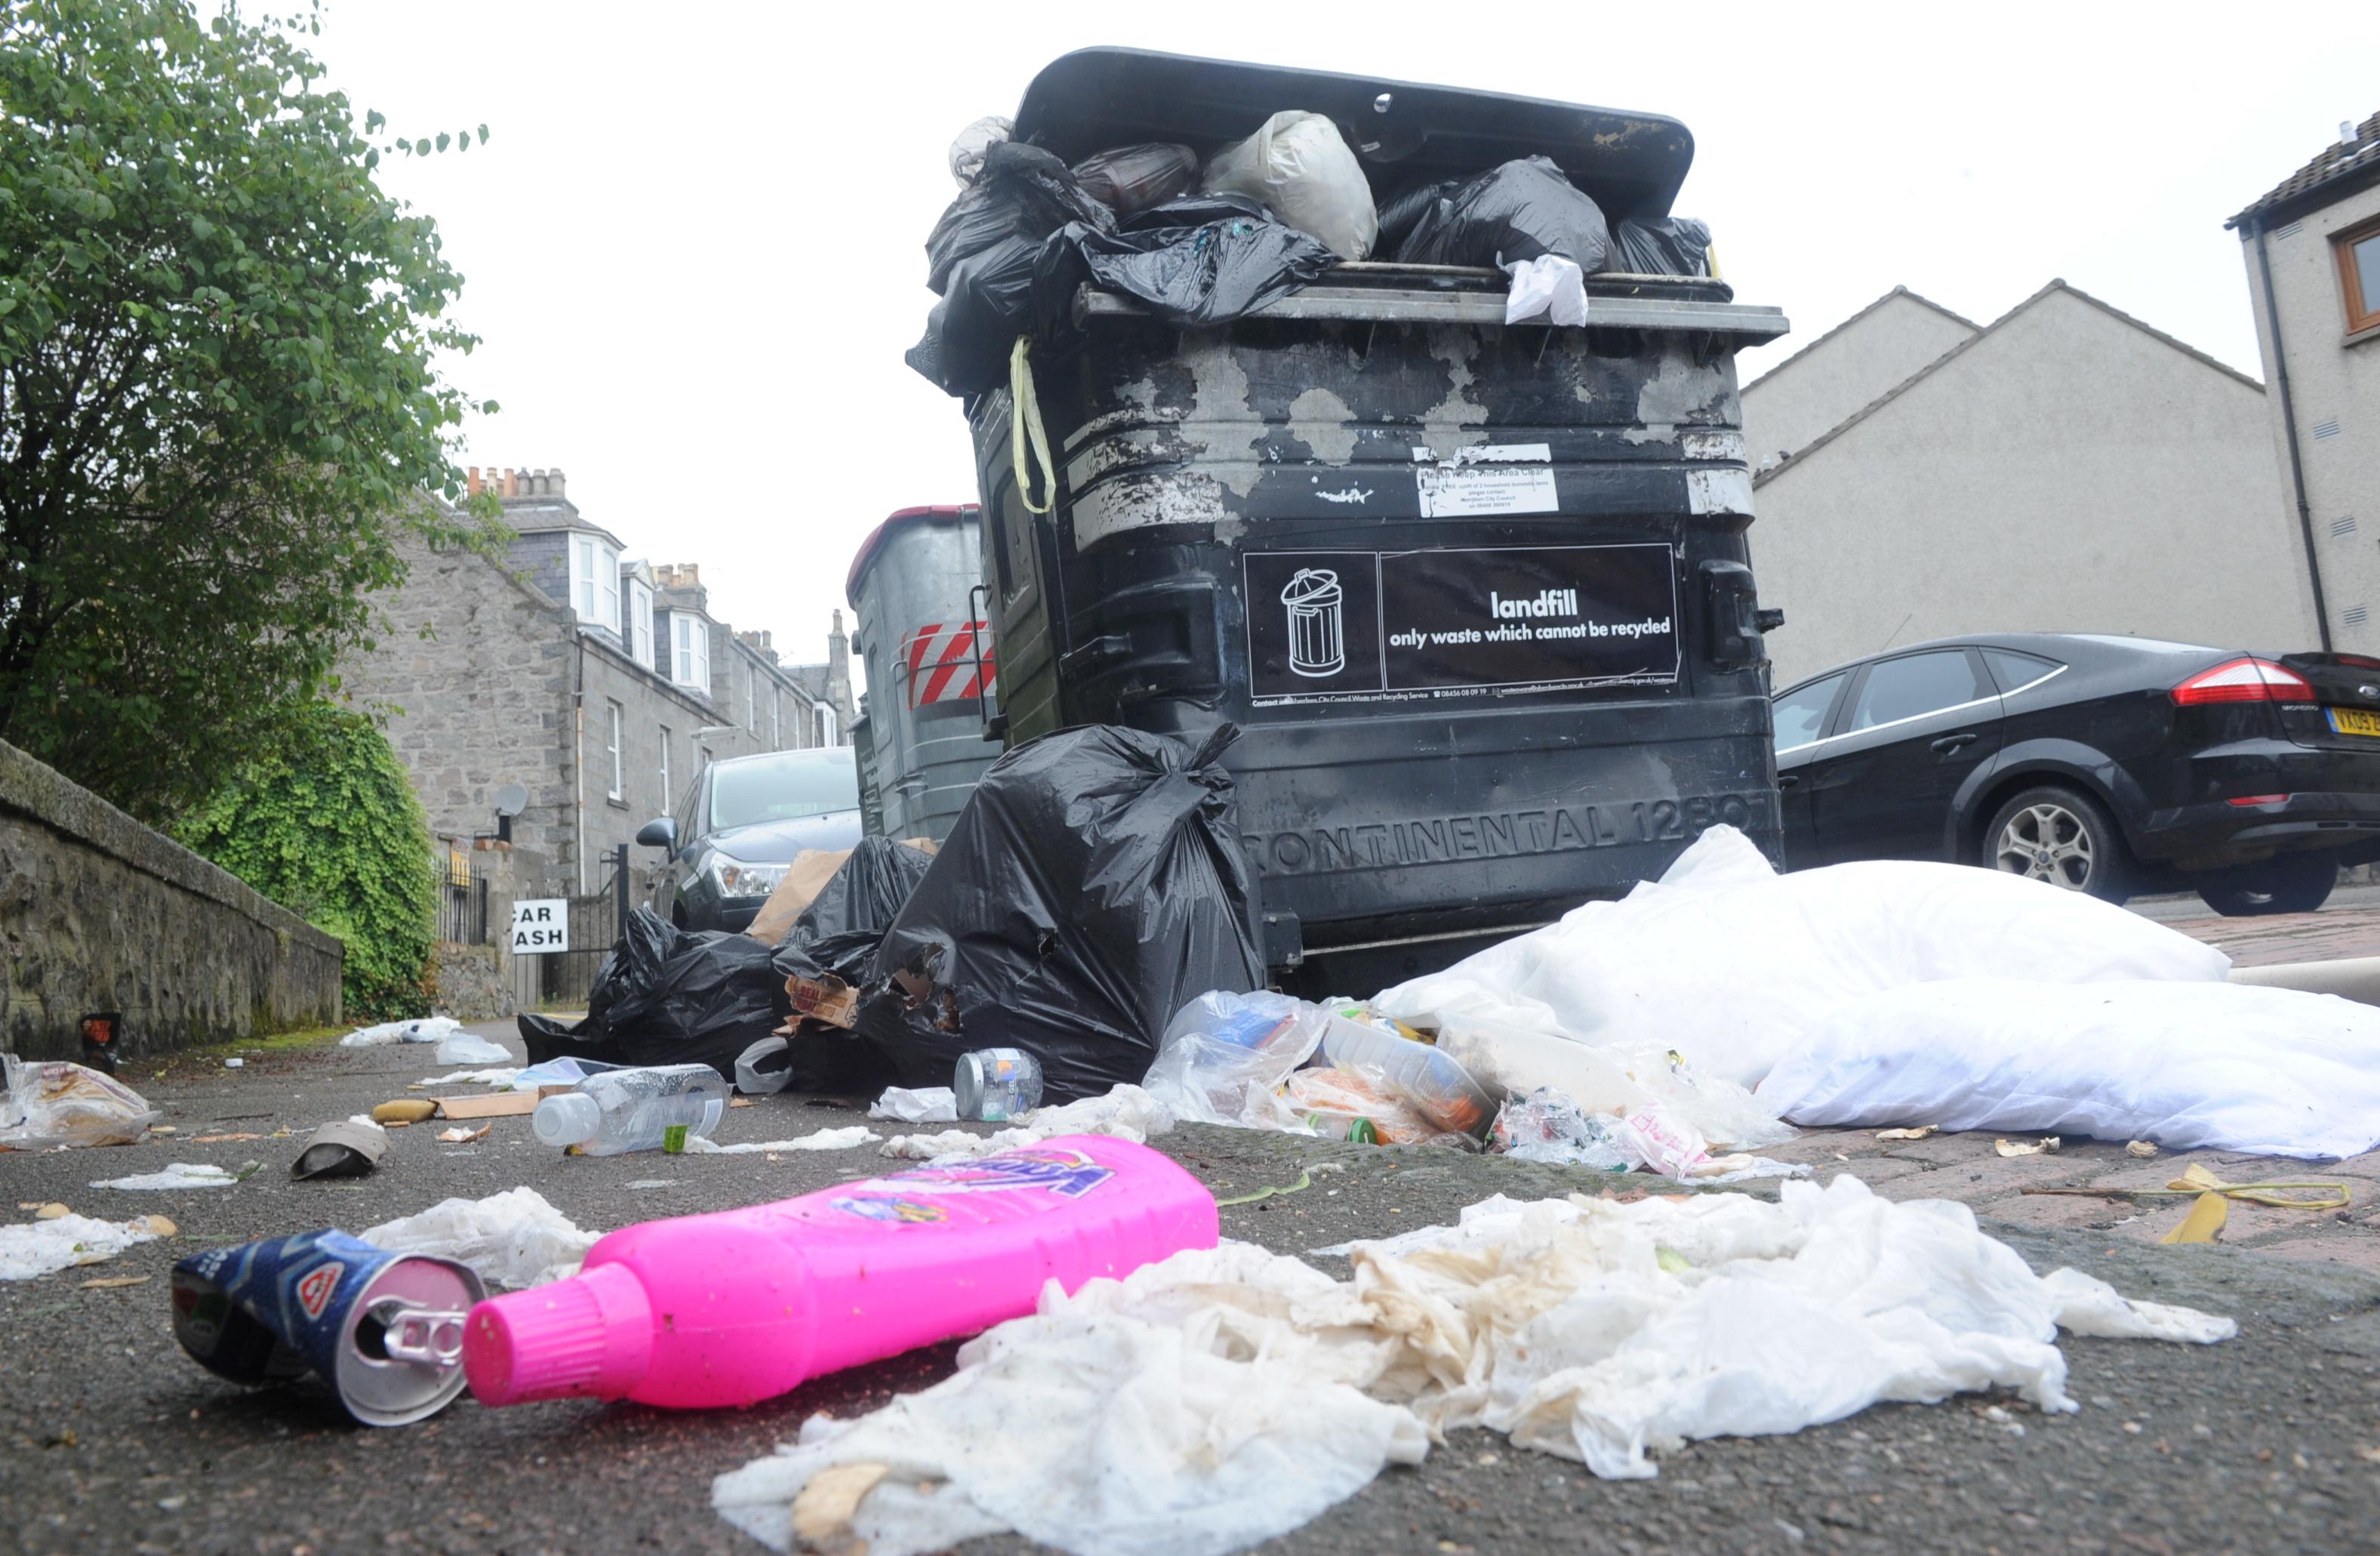 Bins  were left overflowing on the city's Jute Street.